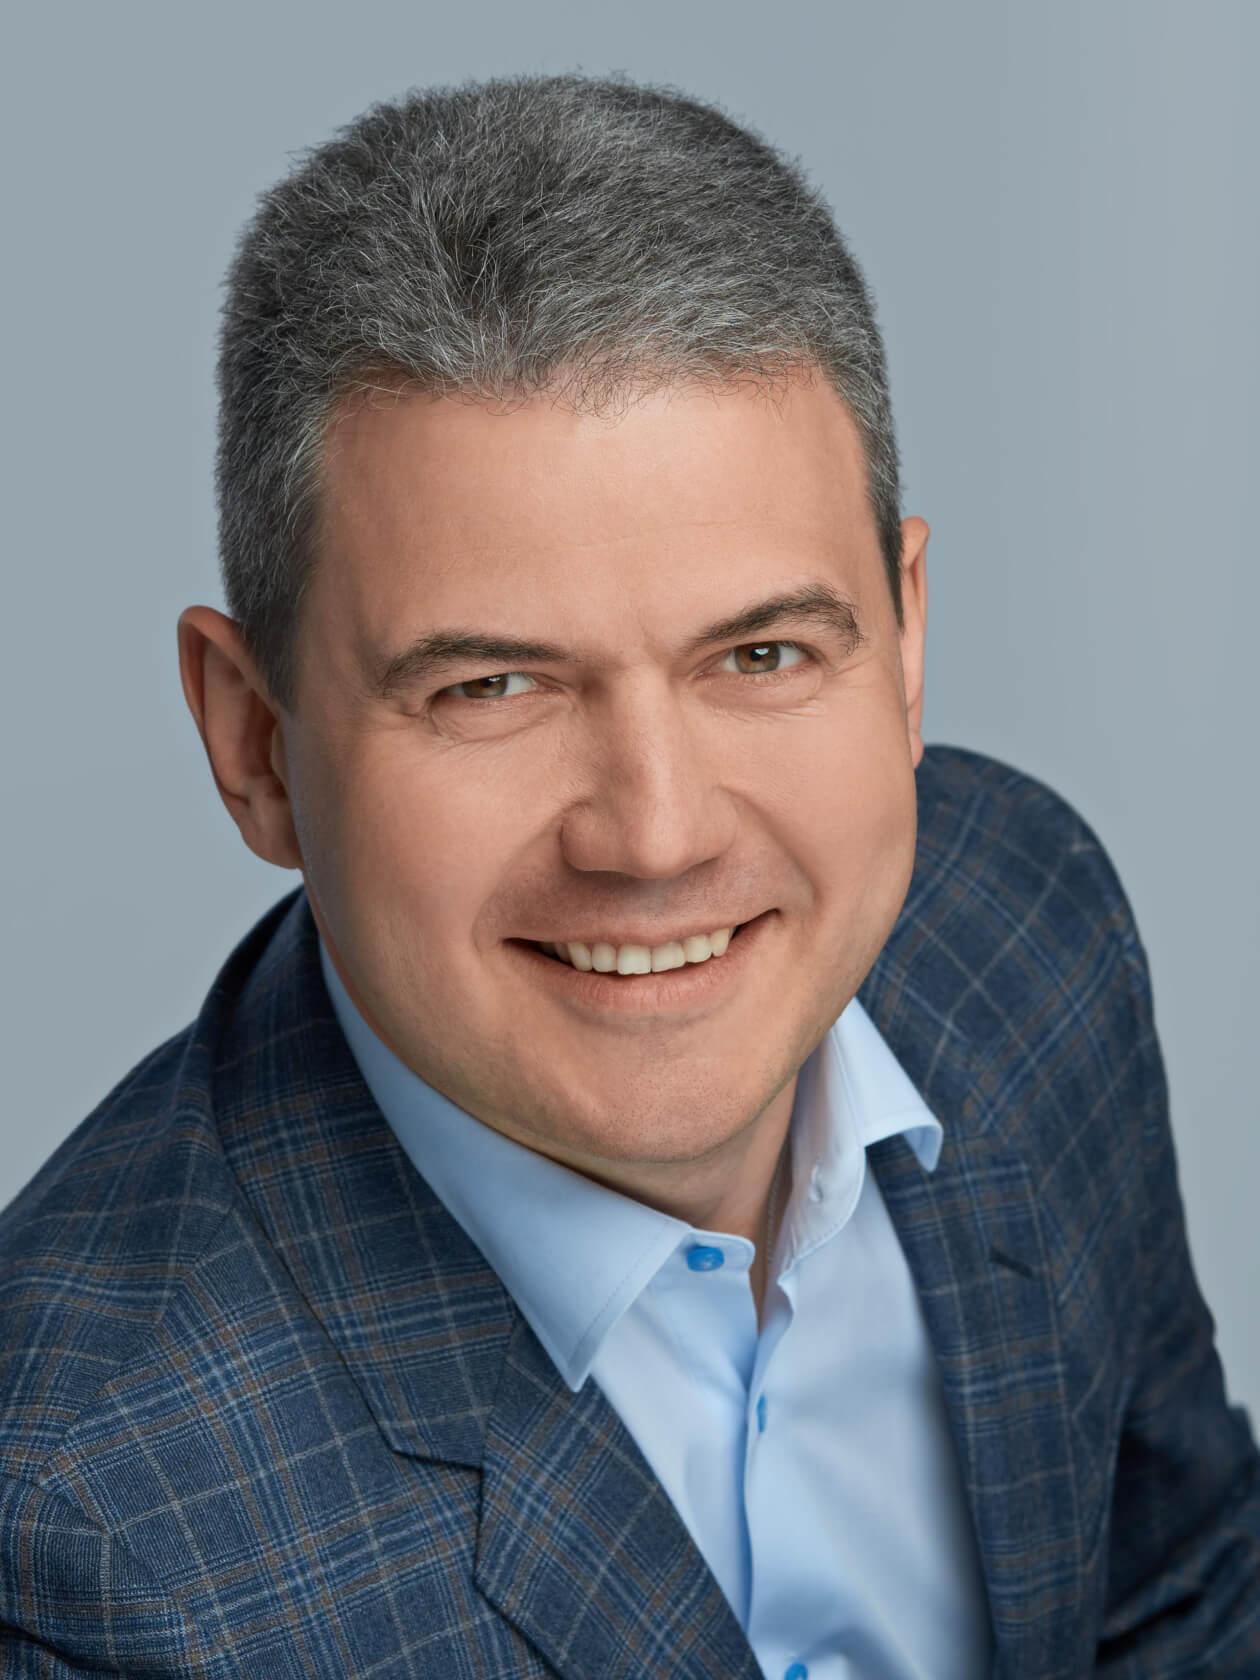 Интервью CEO NGENIX о безопасности веб-приложений